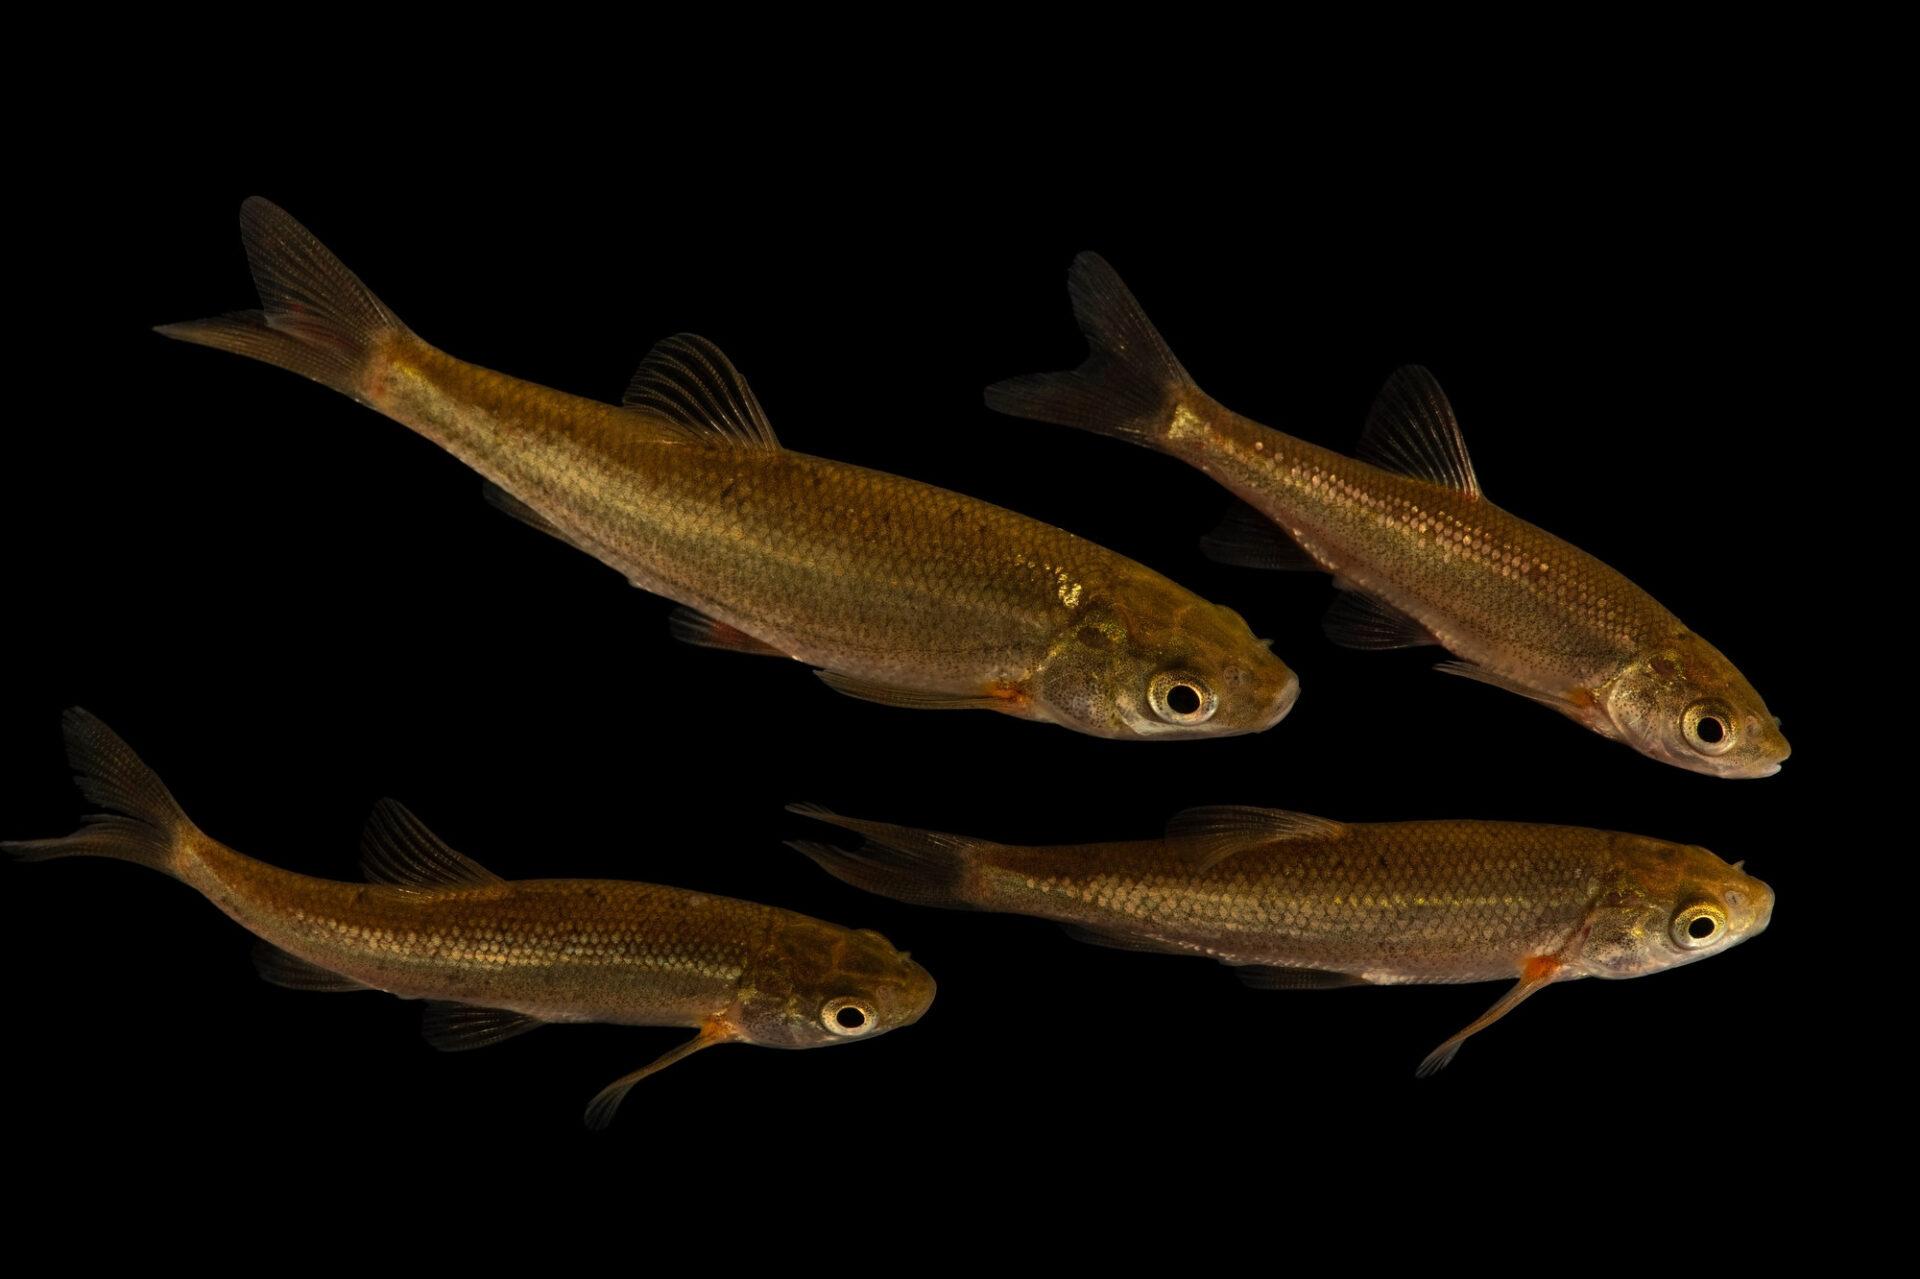 Photo: Critically endangered Boga-do-sudoeste, Iberochondrostoma almacai, rare freshwater fish at the Vasco da Gama Aquarium.